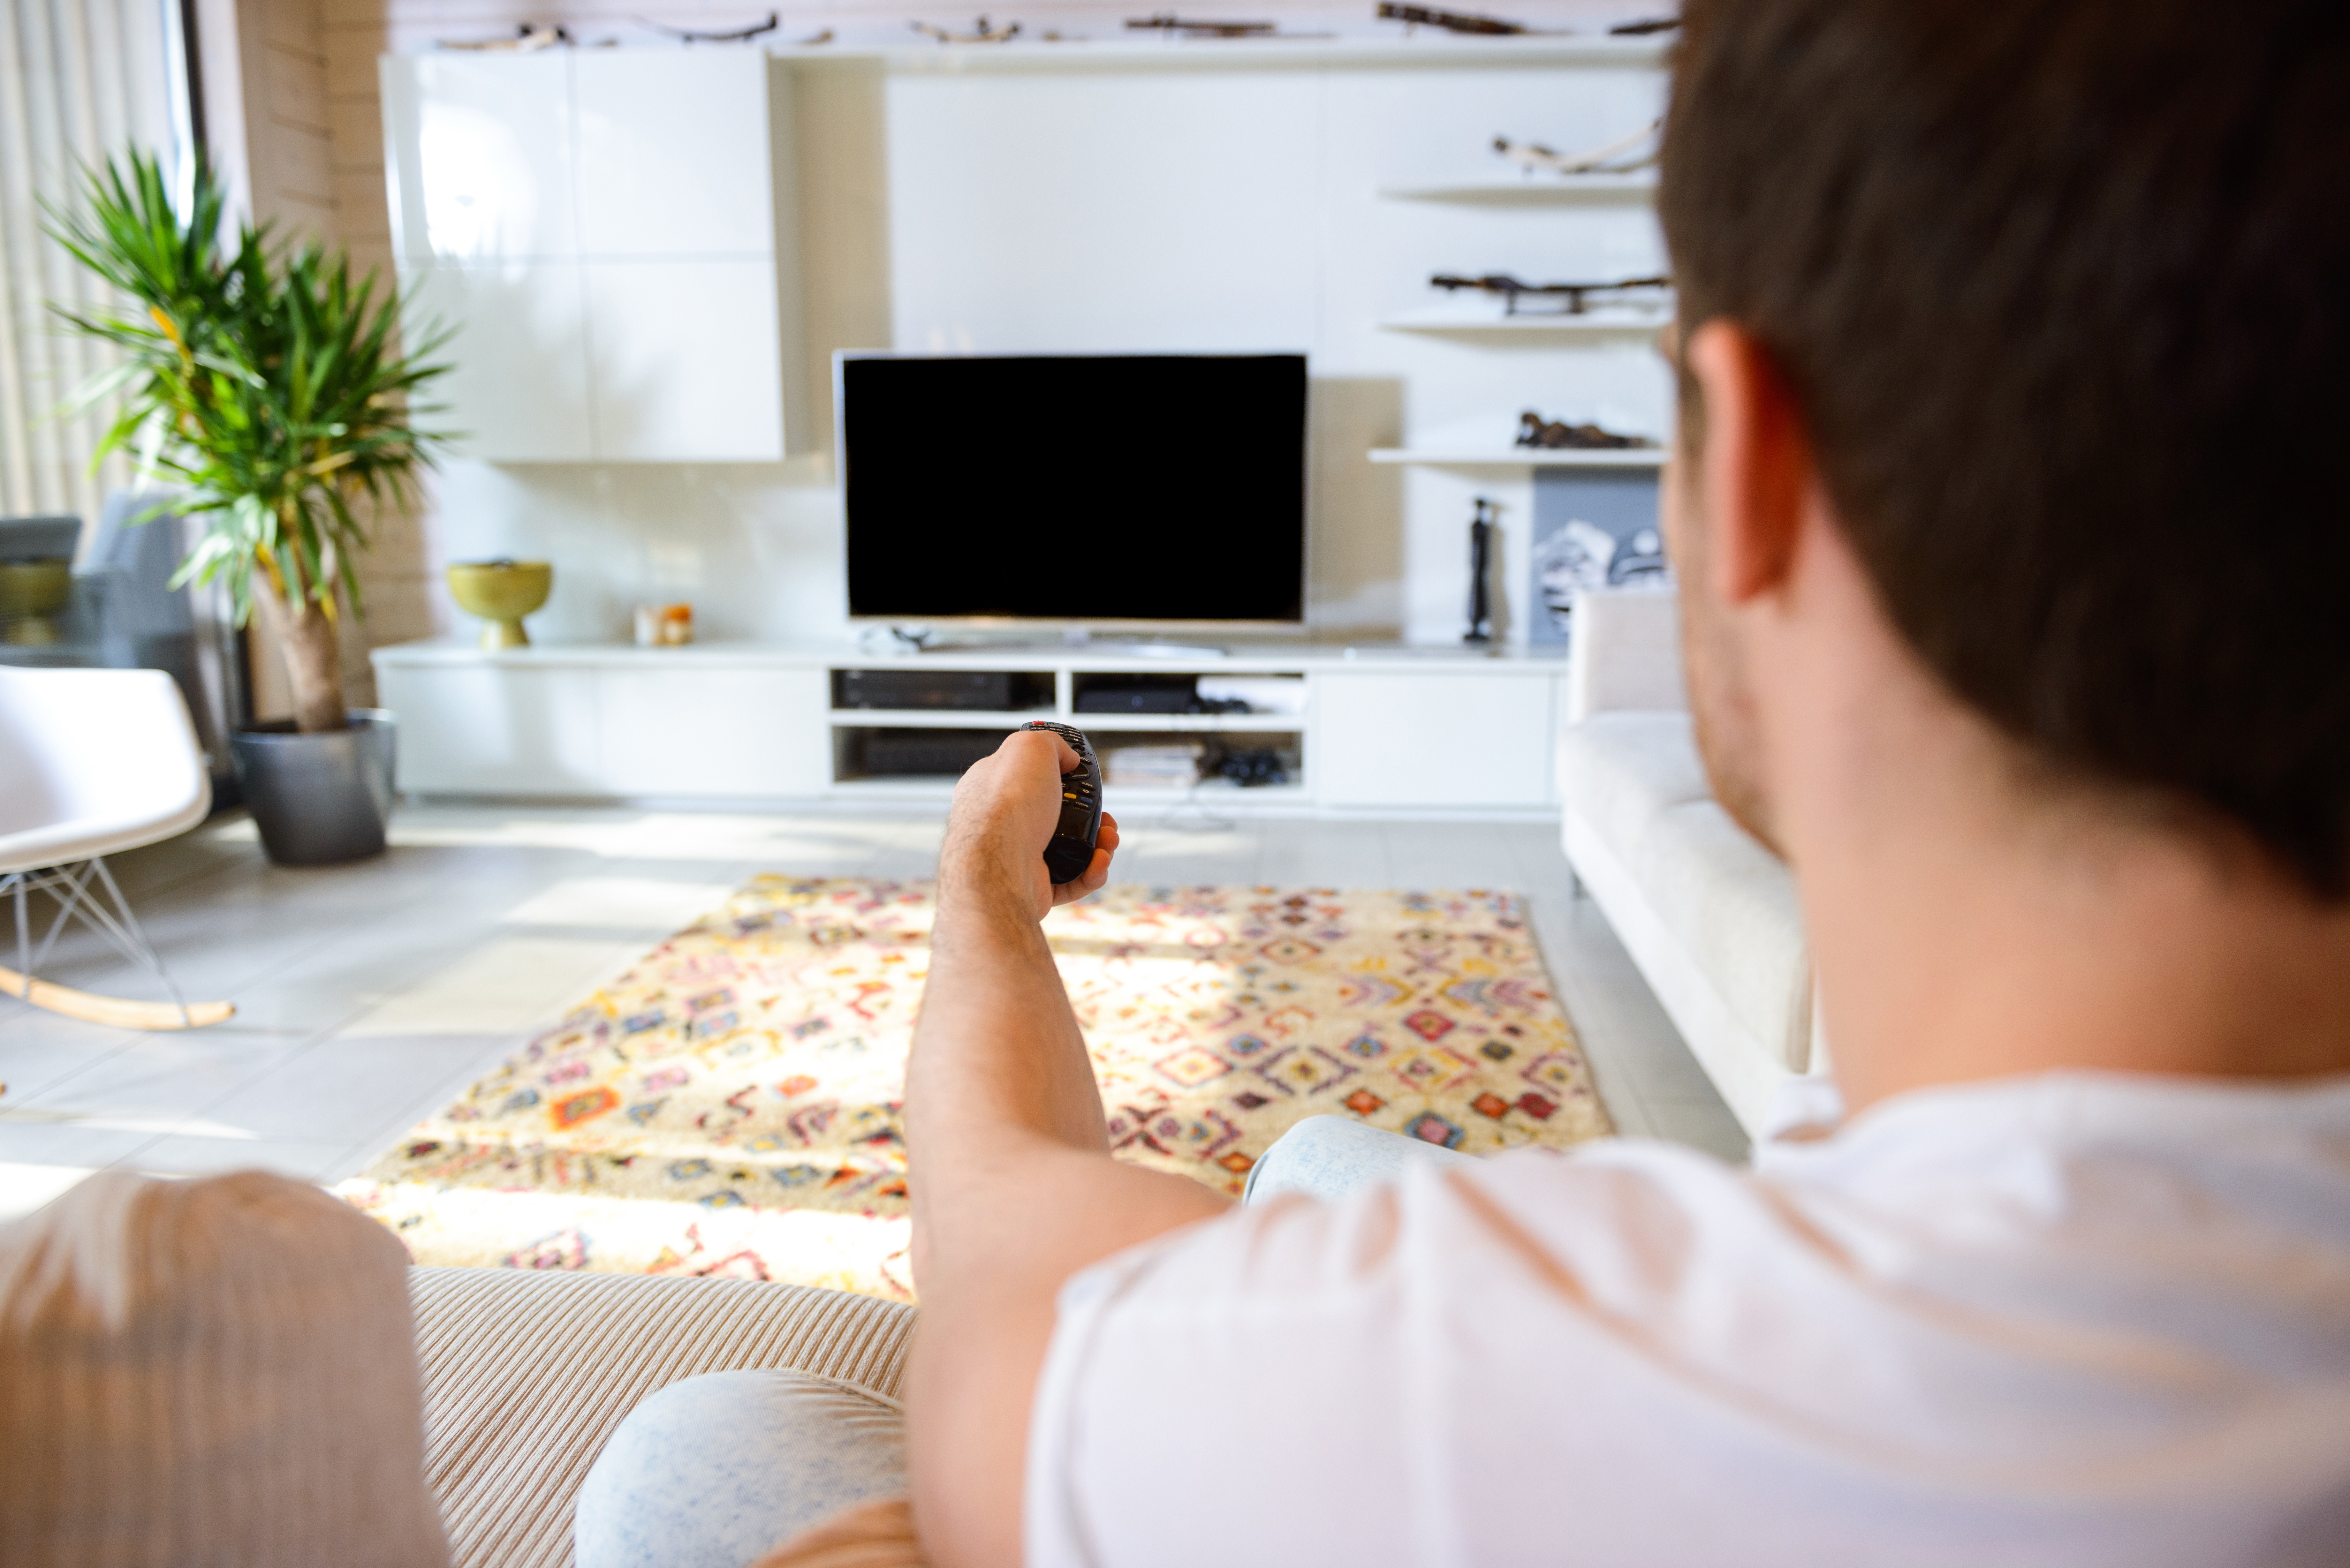 man-sitting-against-tv-PYS8SNJ